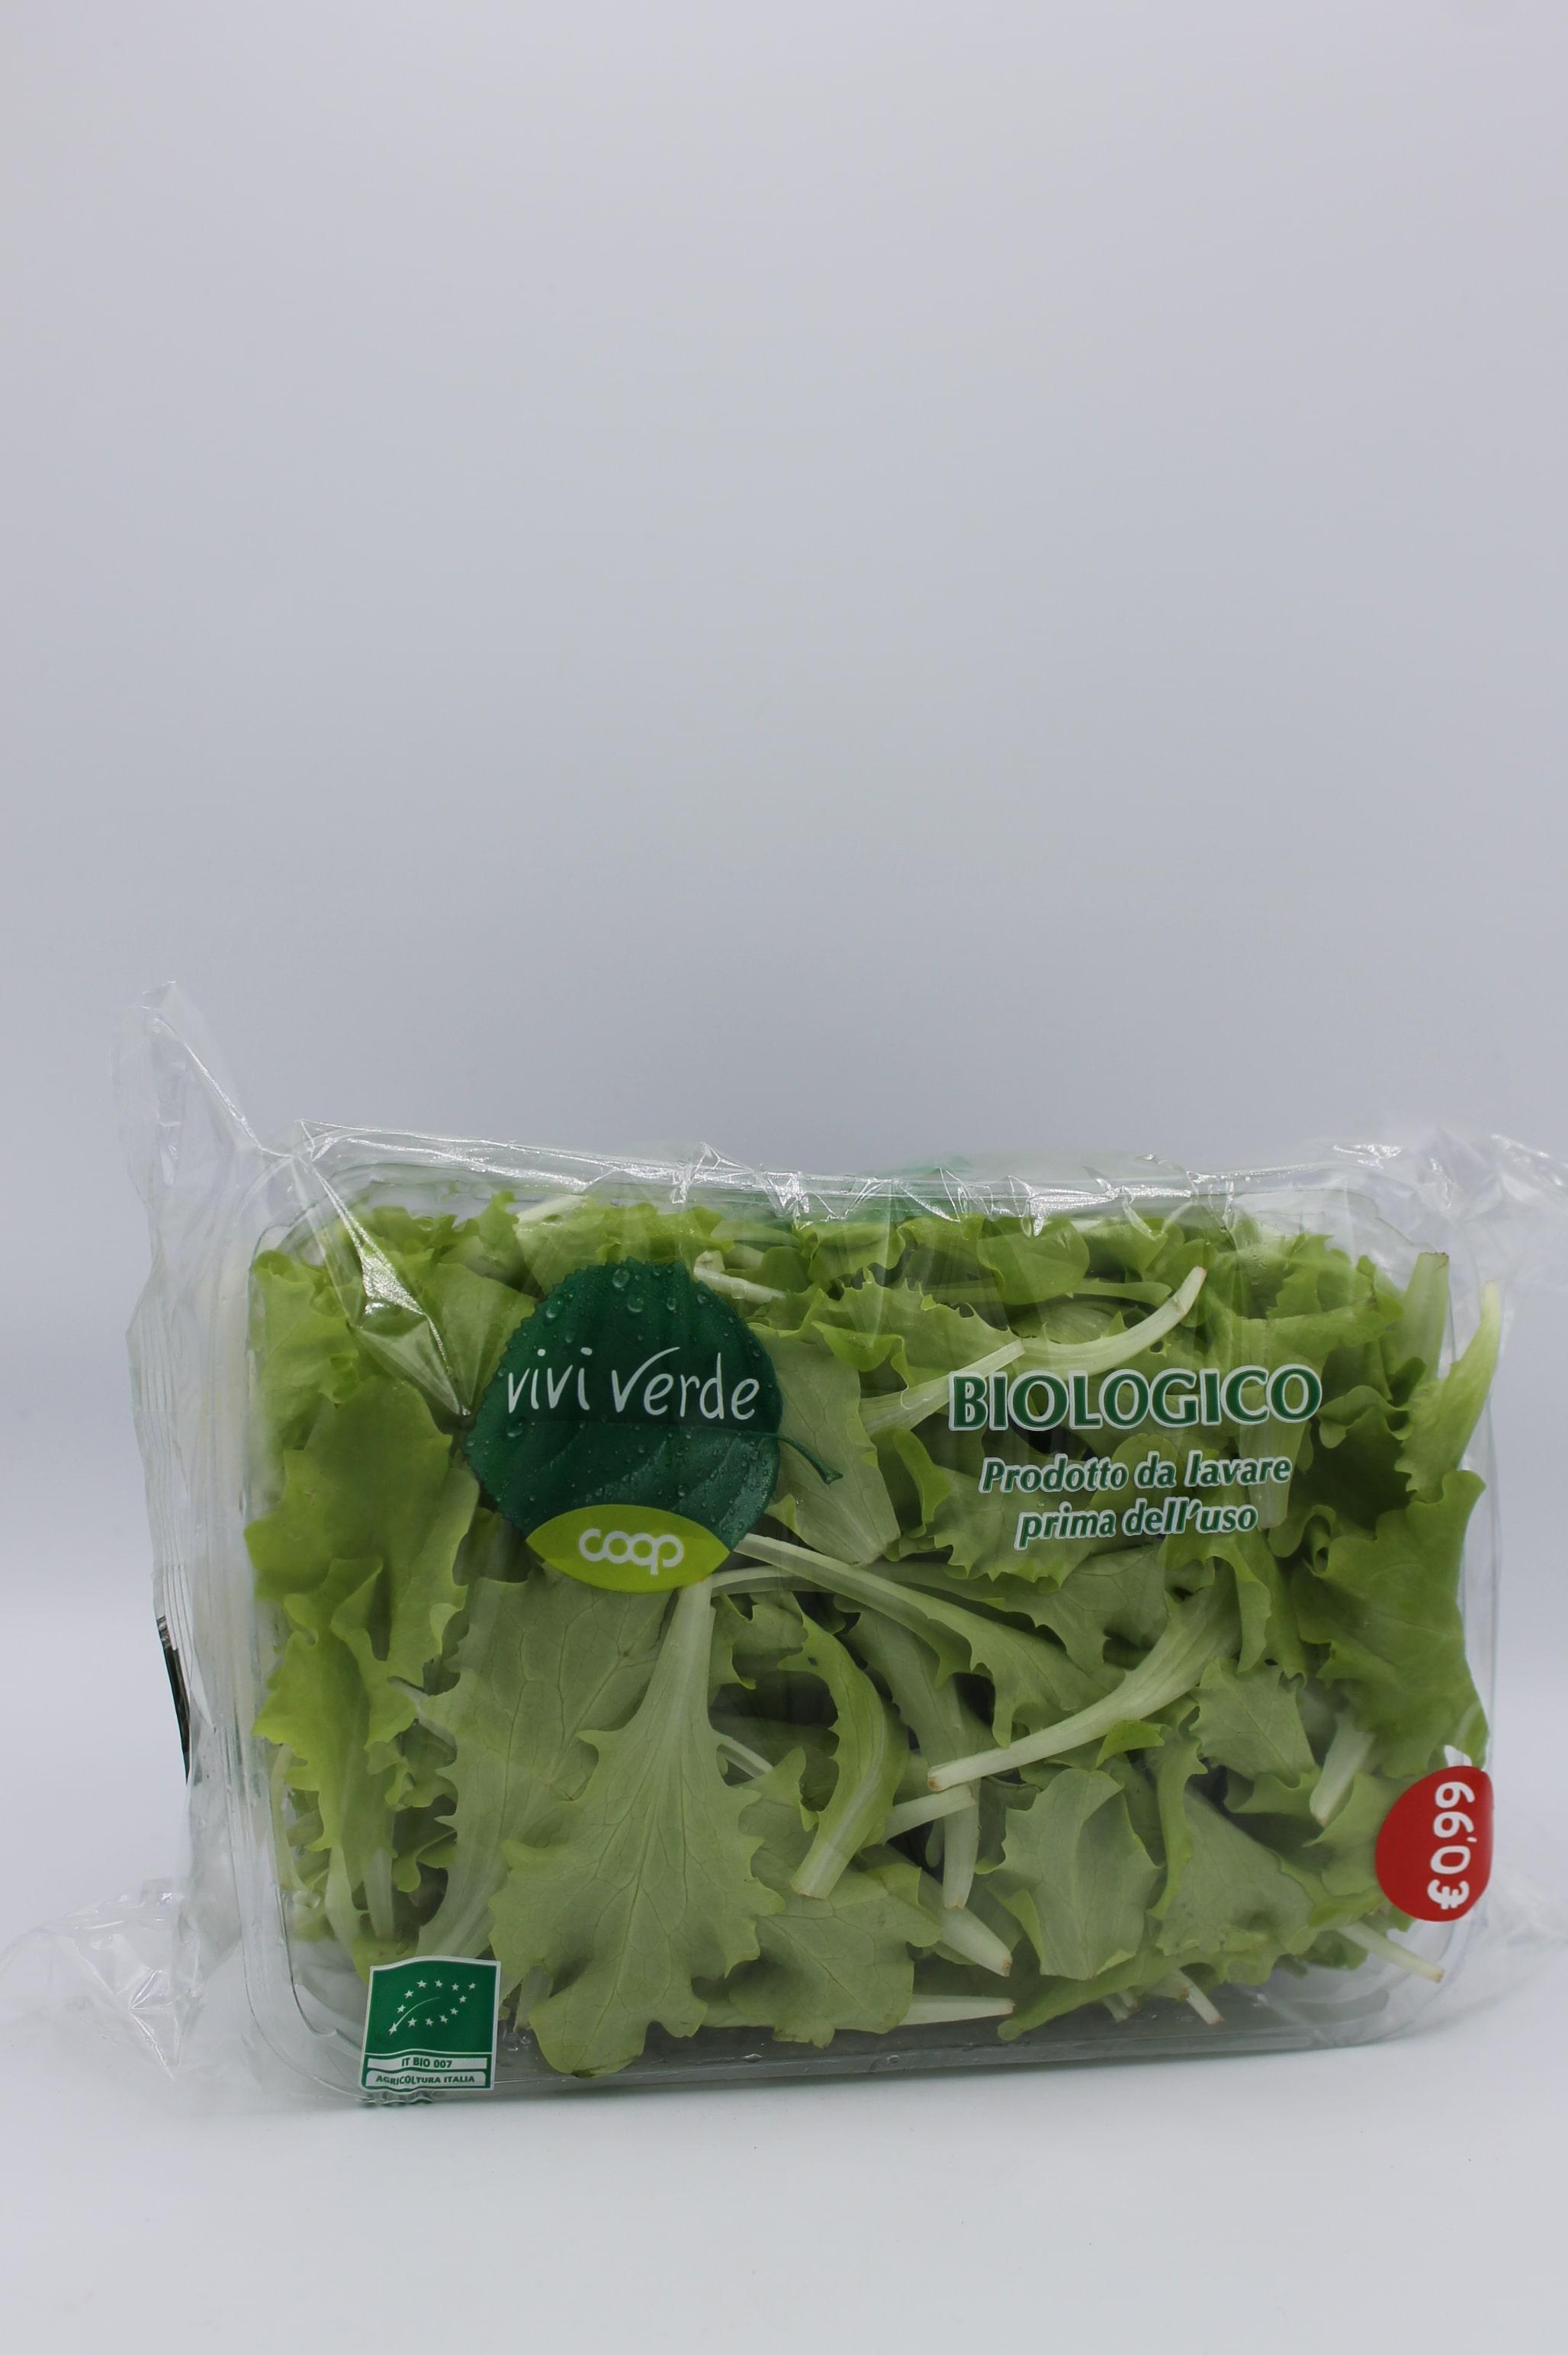 Coop viviverde insalatina bio 100gr.